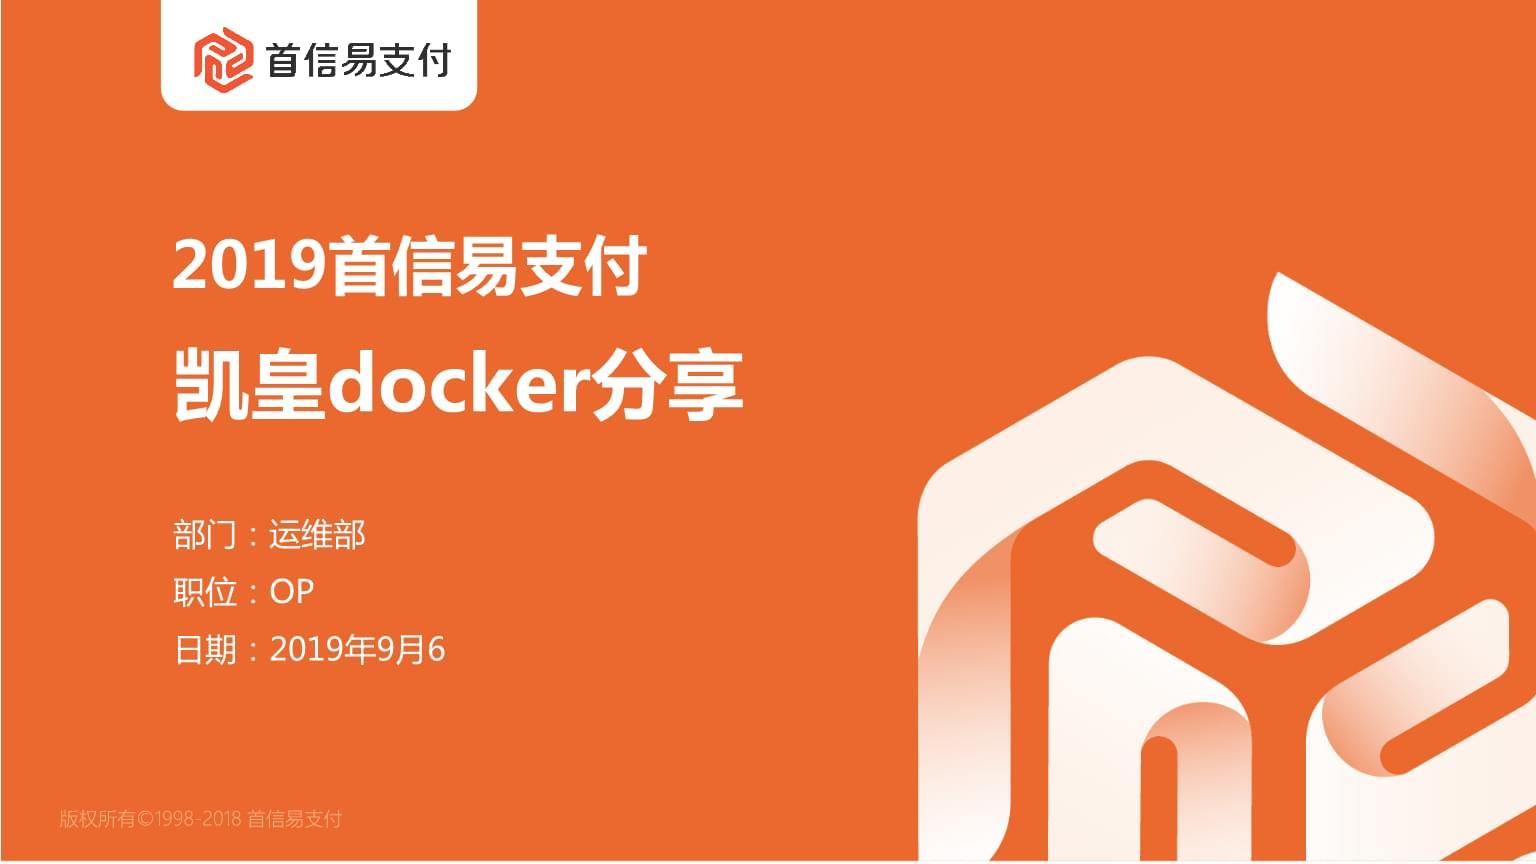 docker容器技术基础入门.pptx